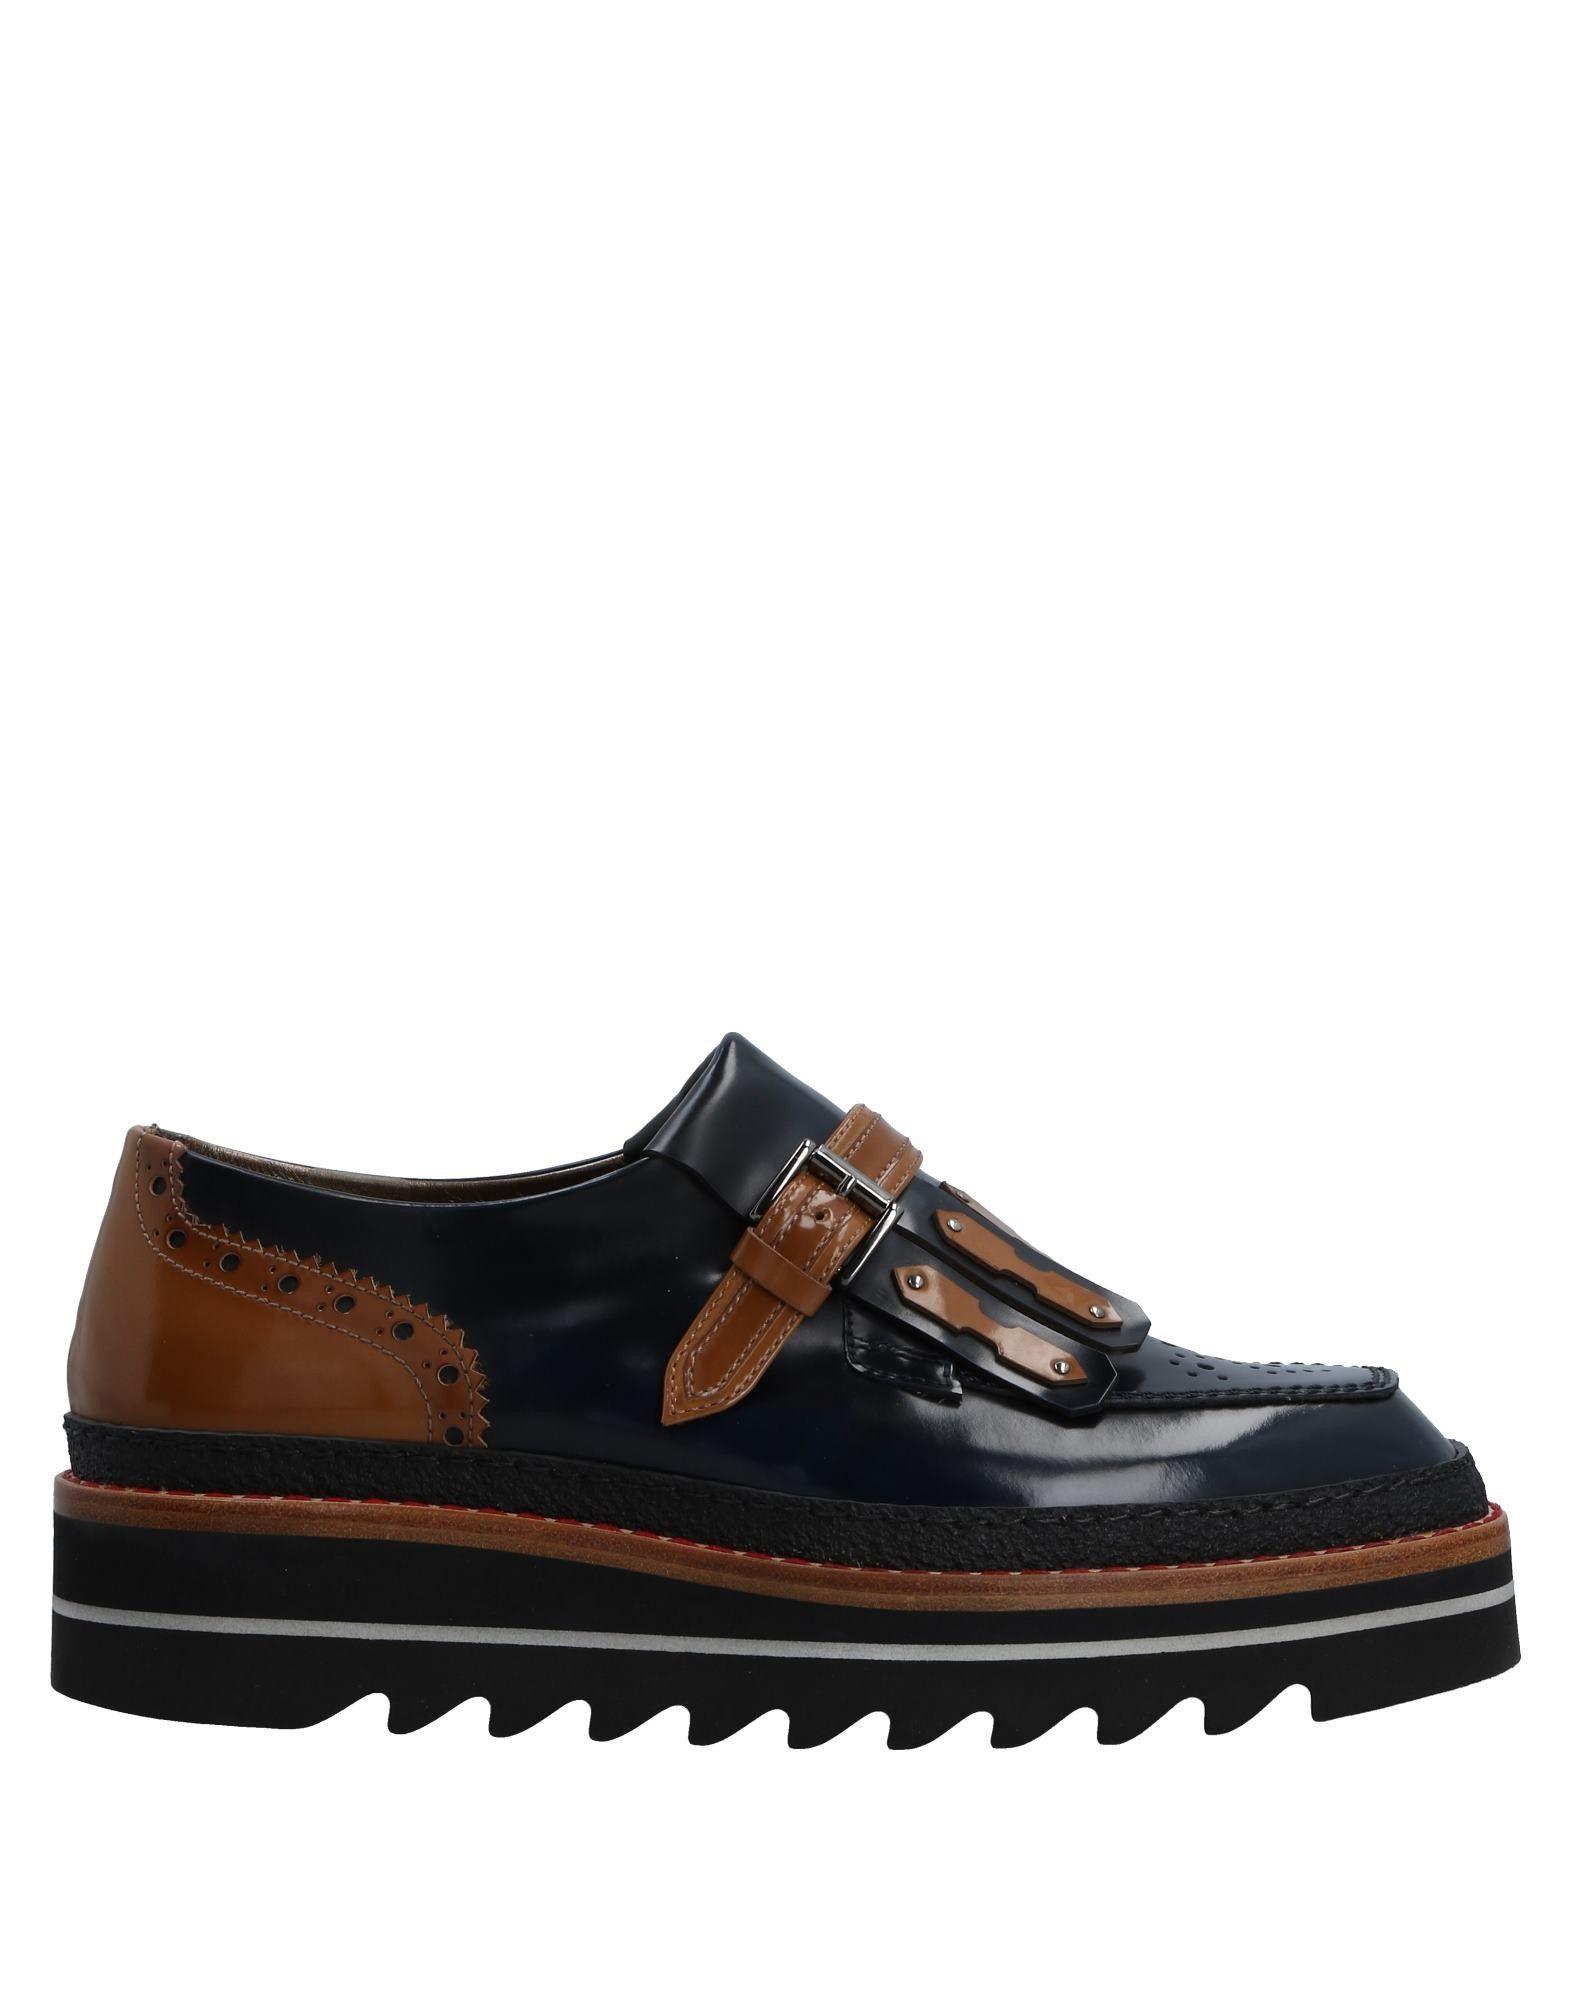 Haltbare Mode billige Schuhe Barracuda Mokassins Damen  11531898VL Heiße Schuhe